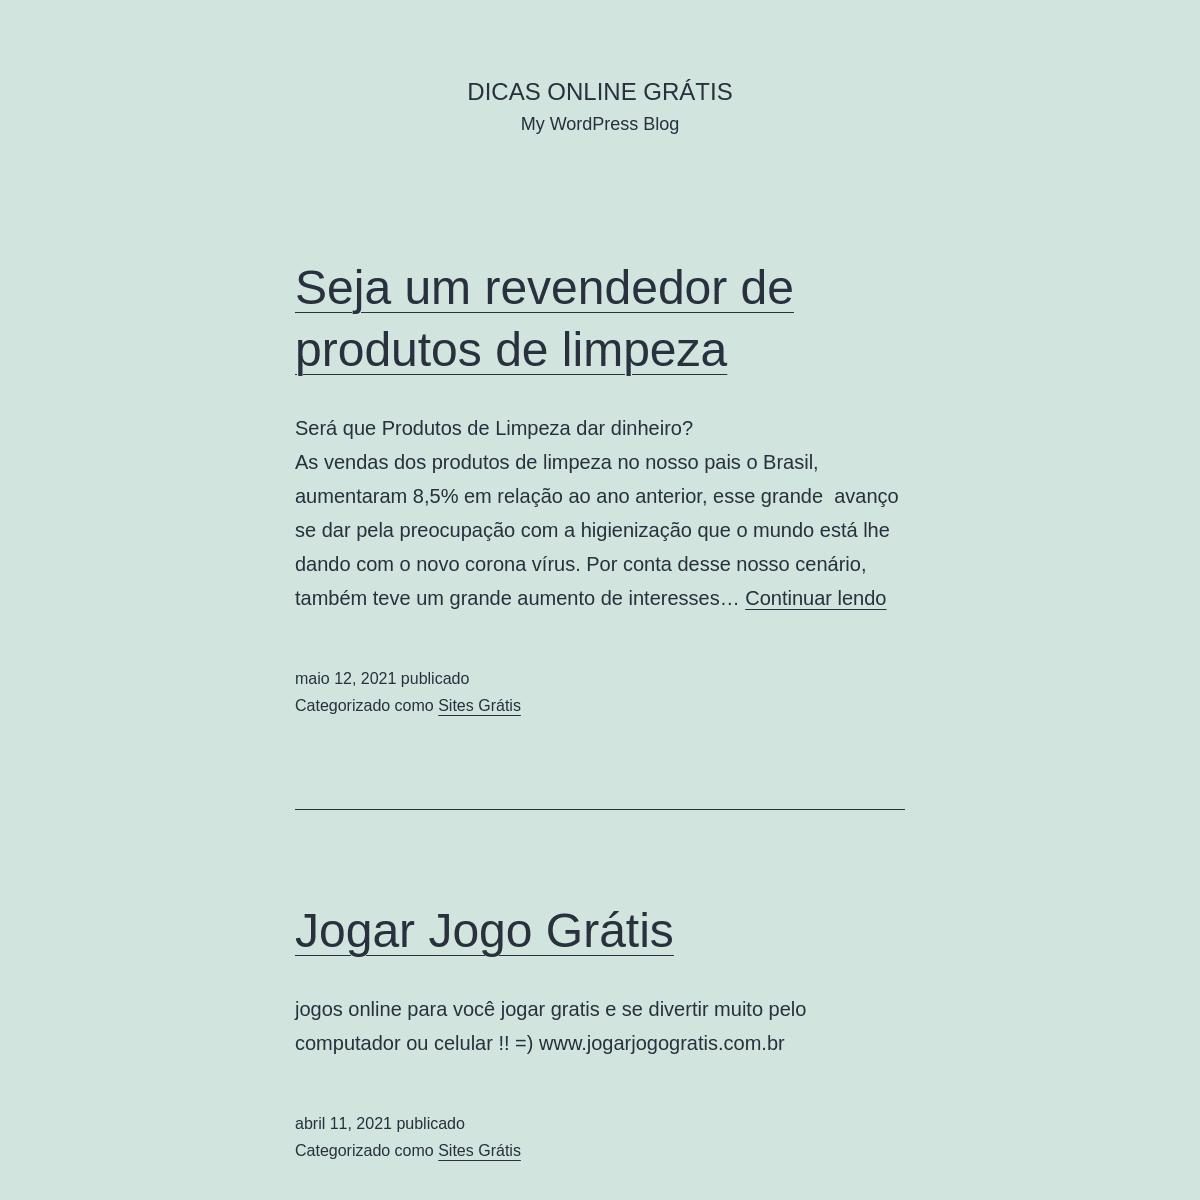 Dicas Online Grátis - My WordPress Blog